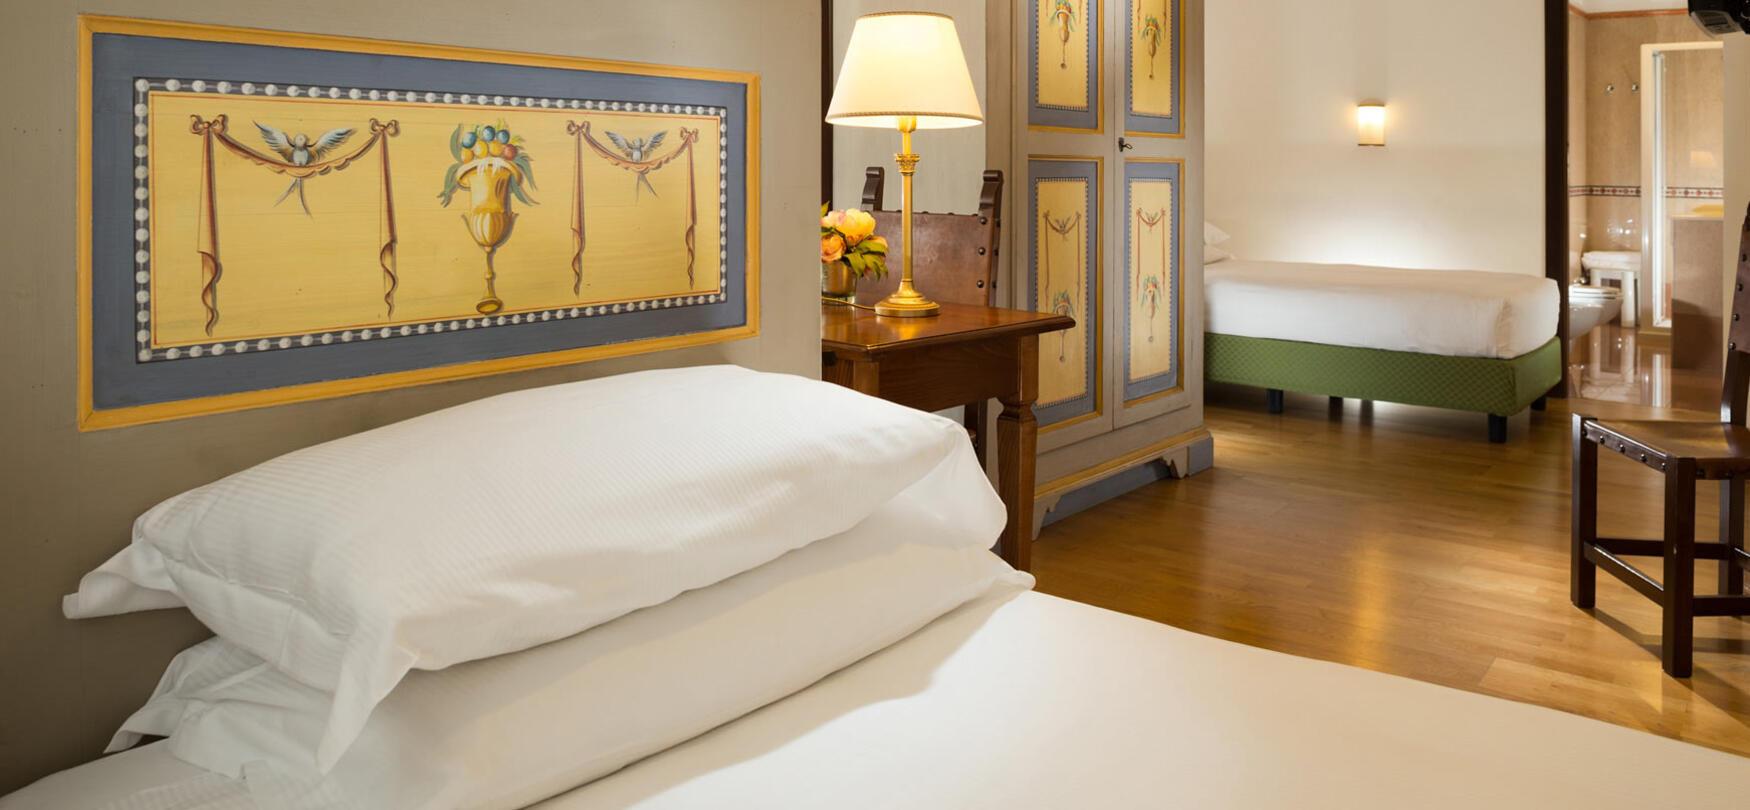 ambienthotels de zimmer-palace-hotel 004